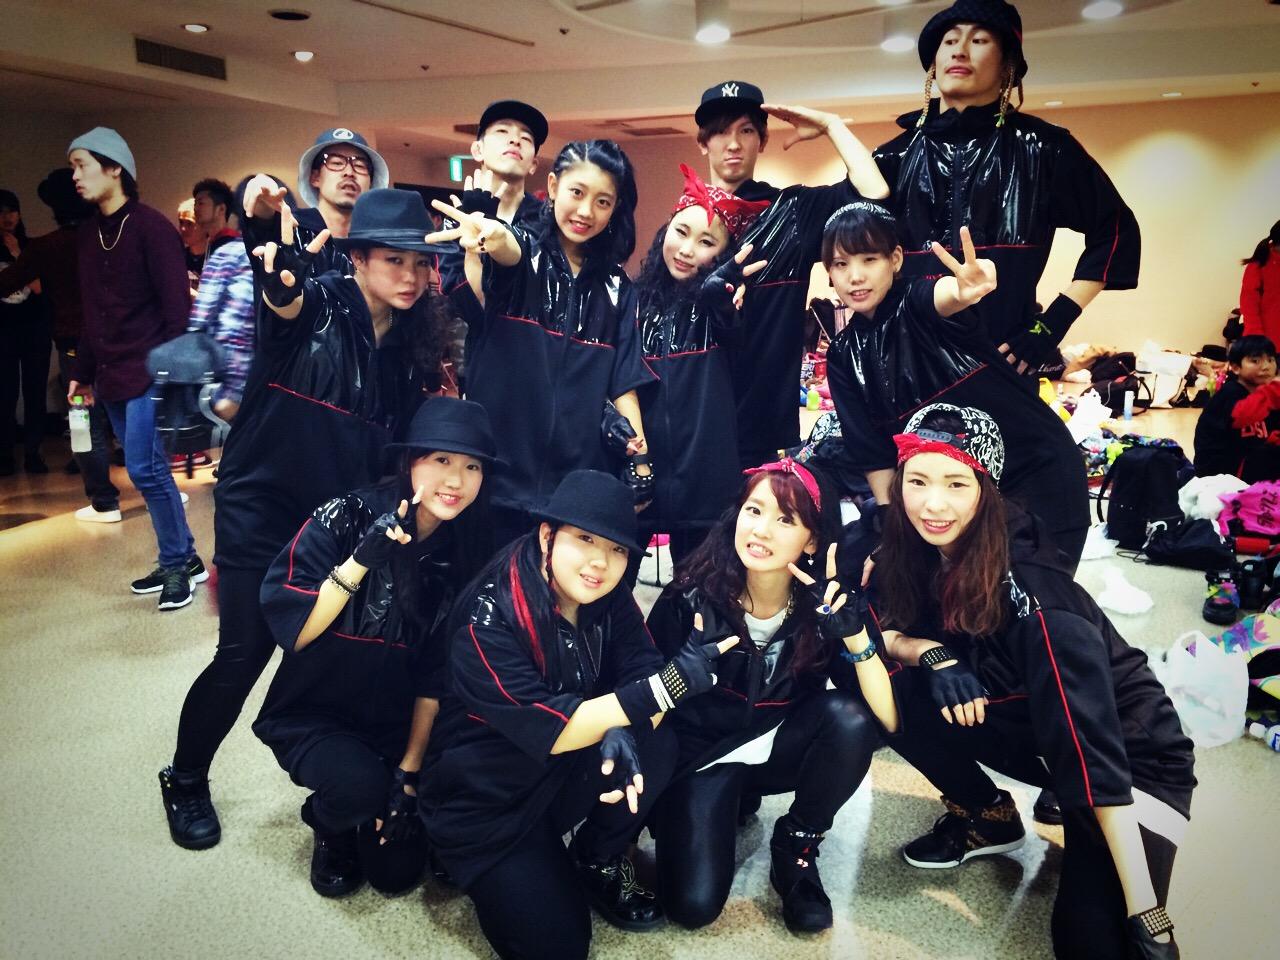 dancelabo_danlabo_dance_hiphop_nexx_ダンス部_発表会_ダンス_ヒップホップ_ストリート_衣装_製作_オリジナル_ユニフォーム_ステージ_学園祭_ダンスラボ_ダンラボ_パーカー_tatsuya_dreamstage